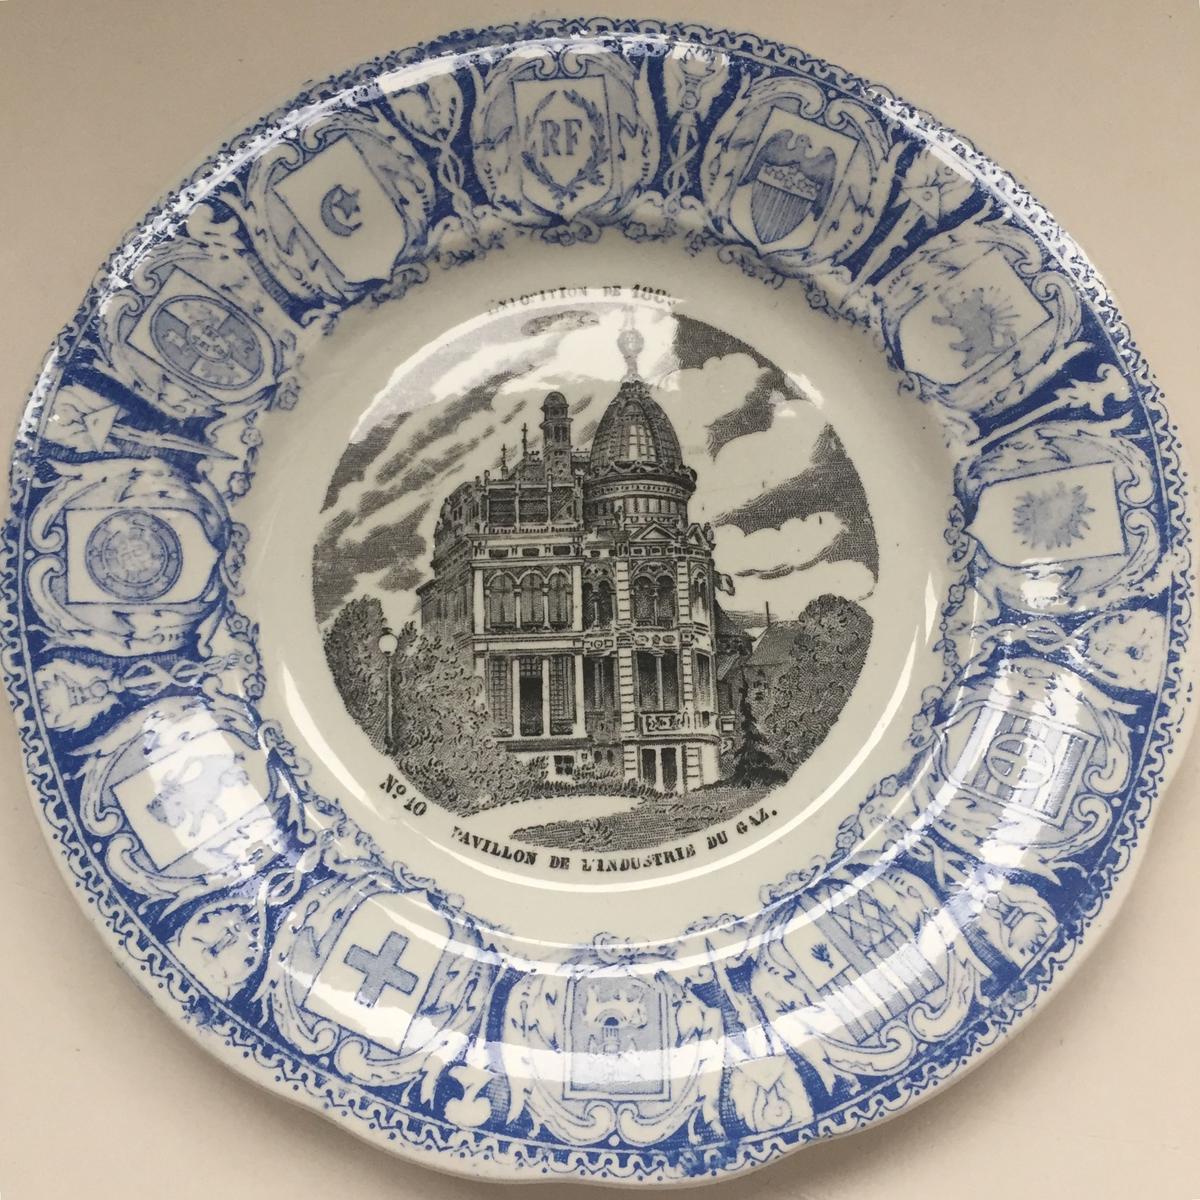 campagne à paris vintage            1889年 クレイユ・エ・モントロー おしゃべりなお皿 パリ世界万博 1−3